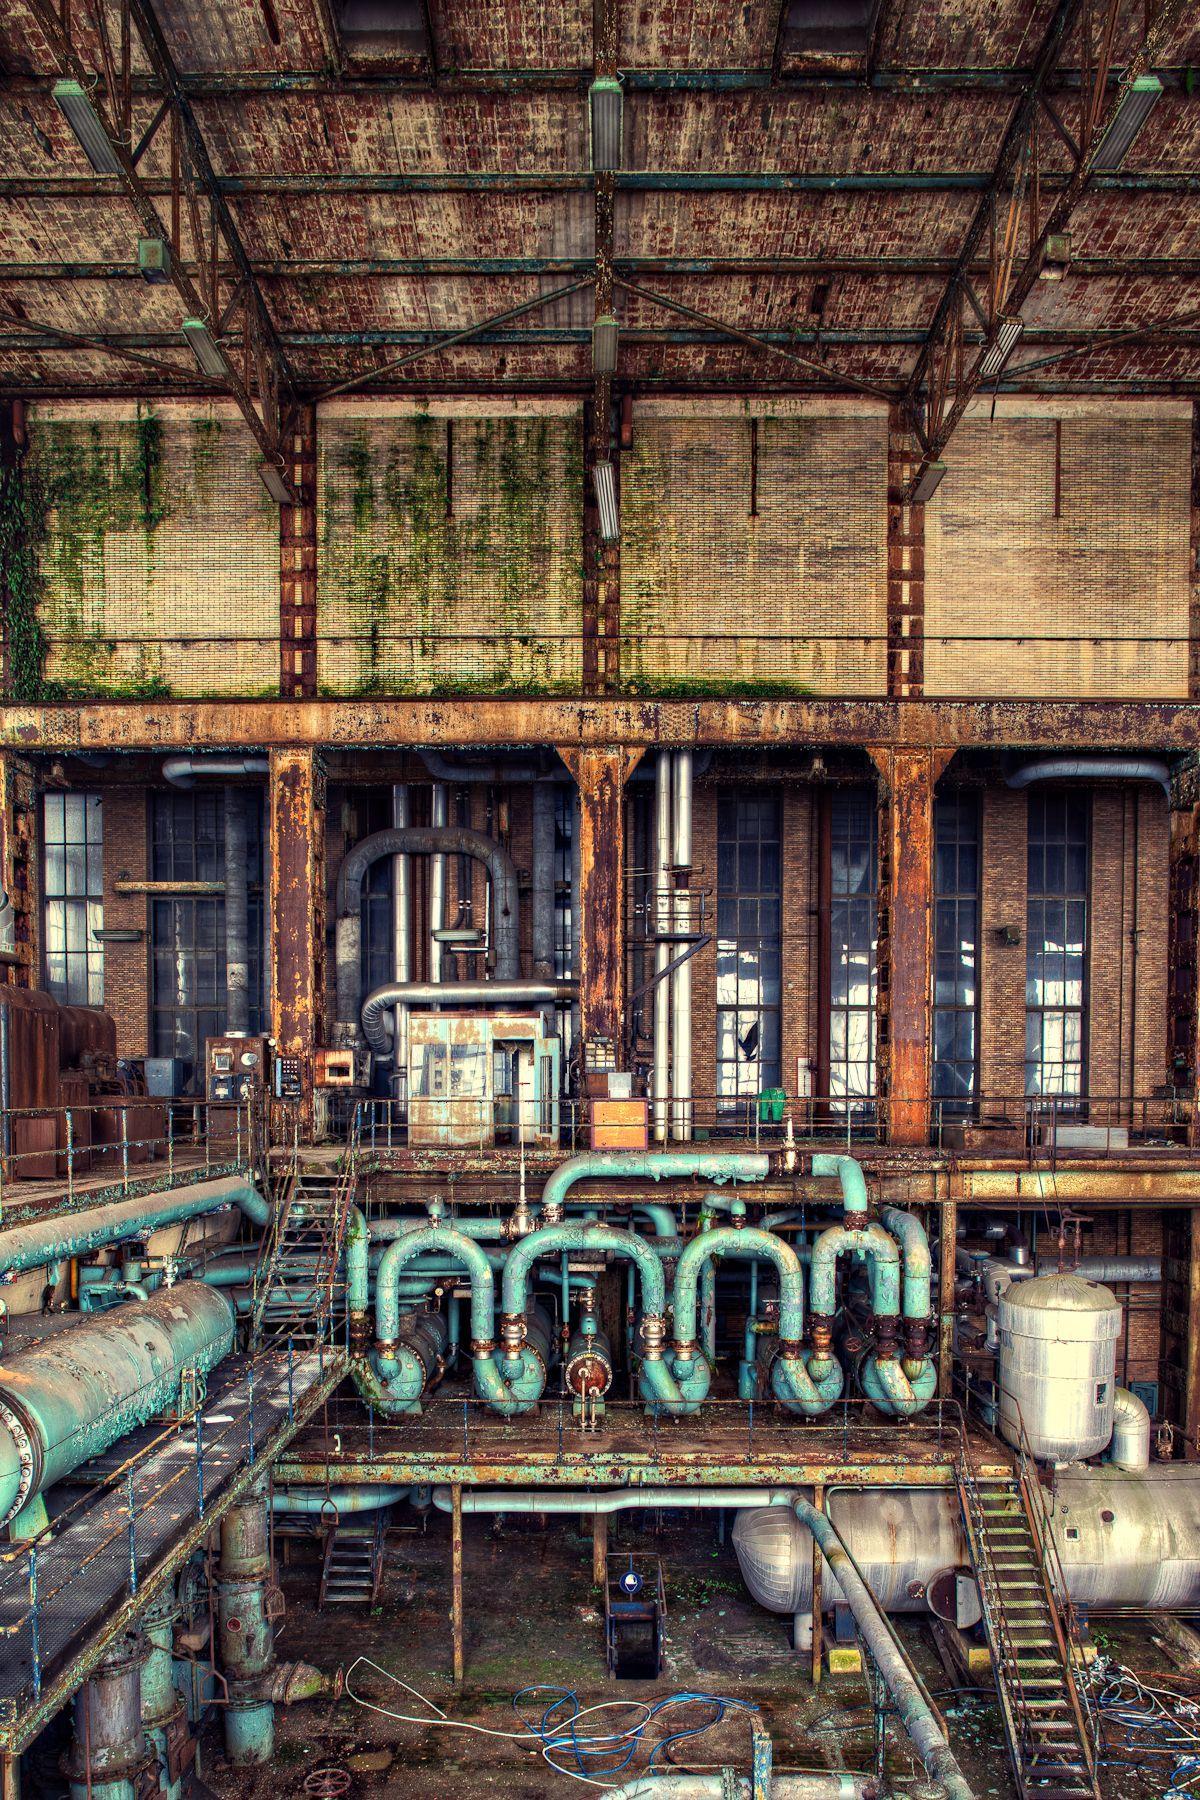 abandoned factory | INDUSTRY | Abandoned, Abandoned ...  abandoned facto...